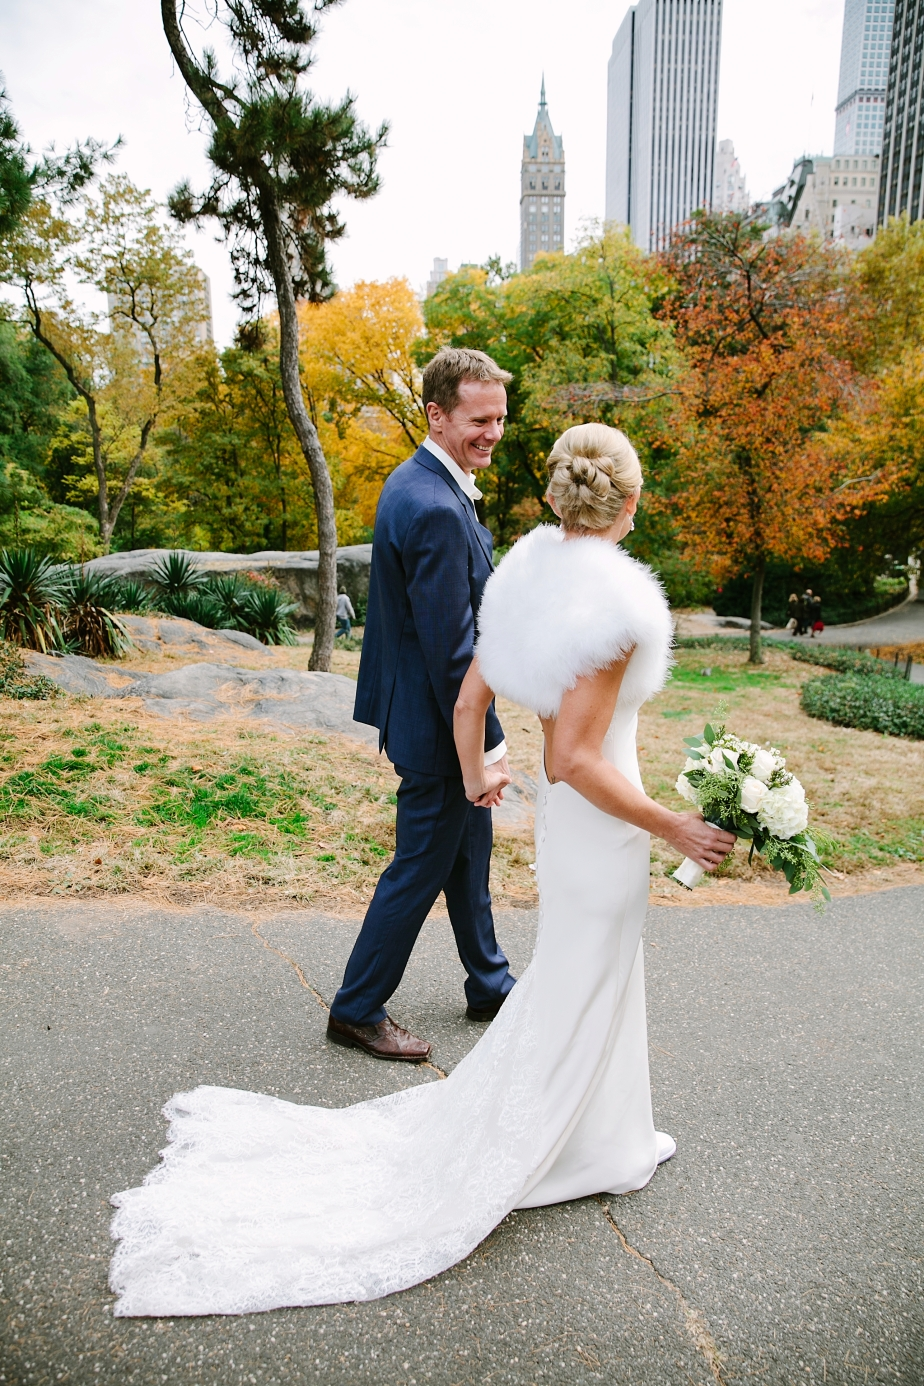 Copcot_centralpark_wedding_TS-259